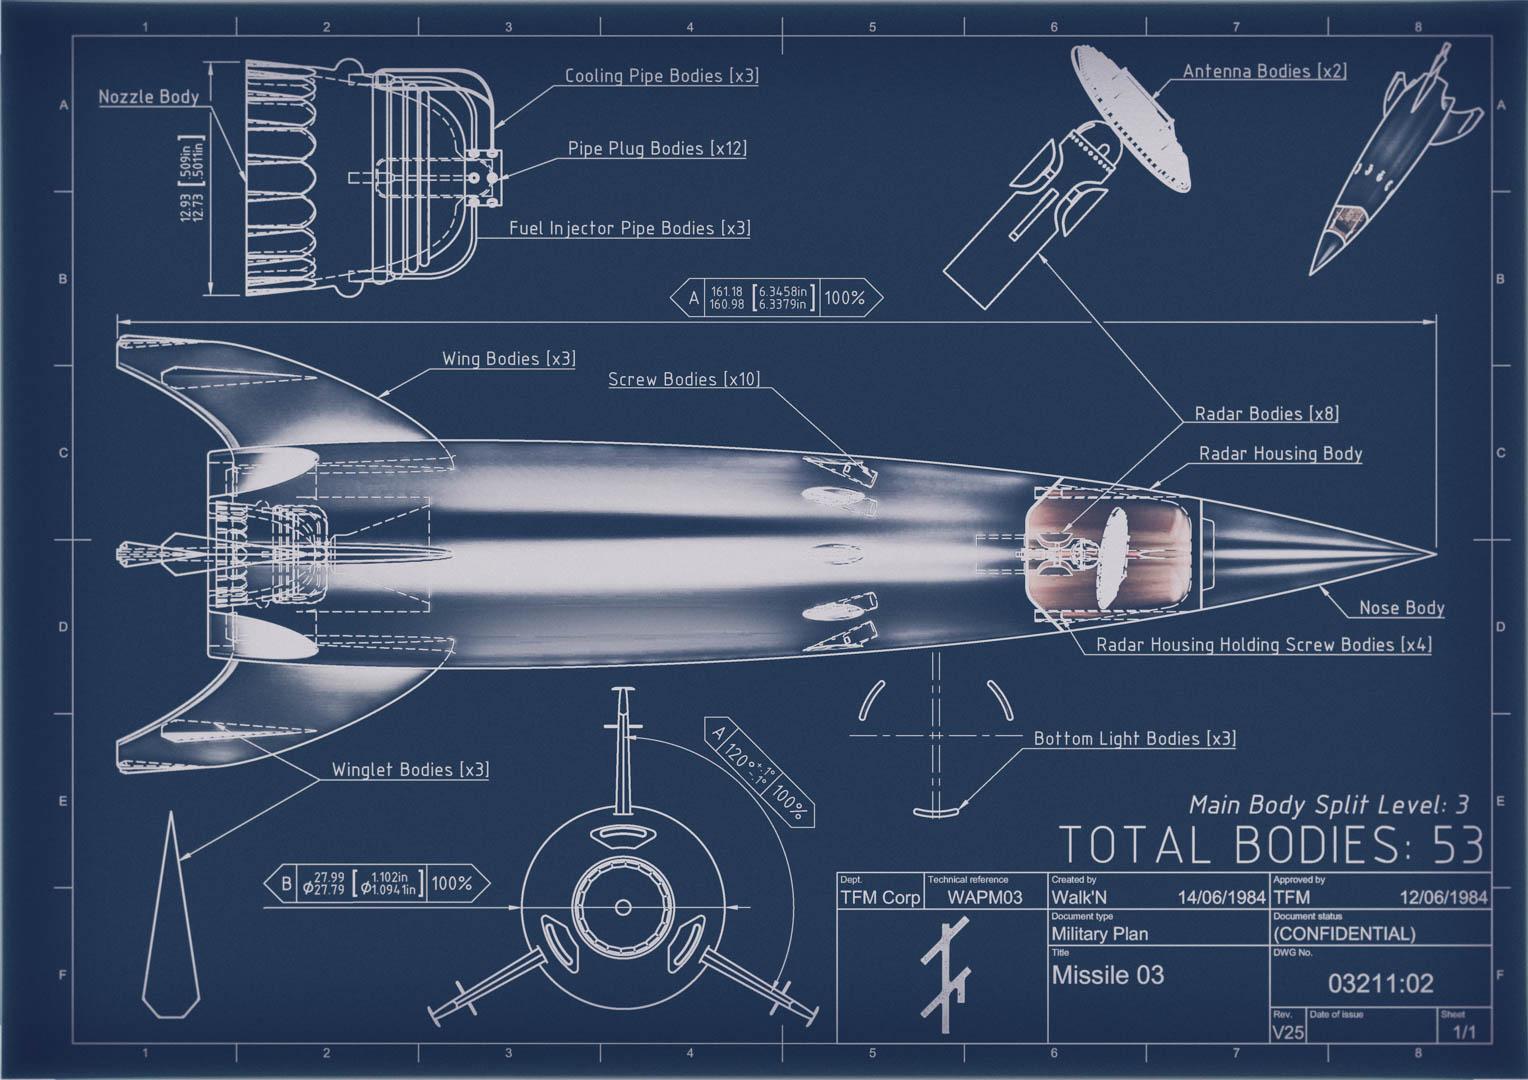 Missile Asset Kit - Missile 04.jpg